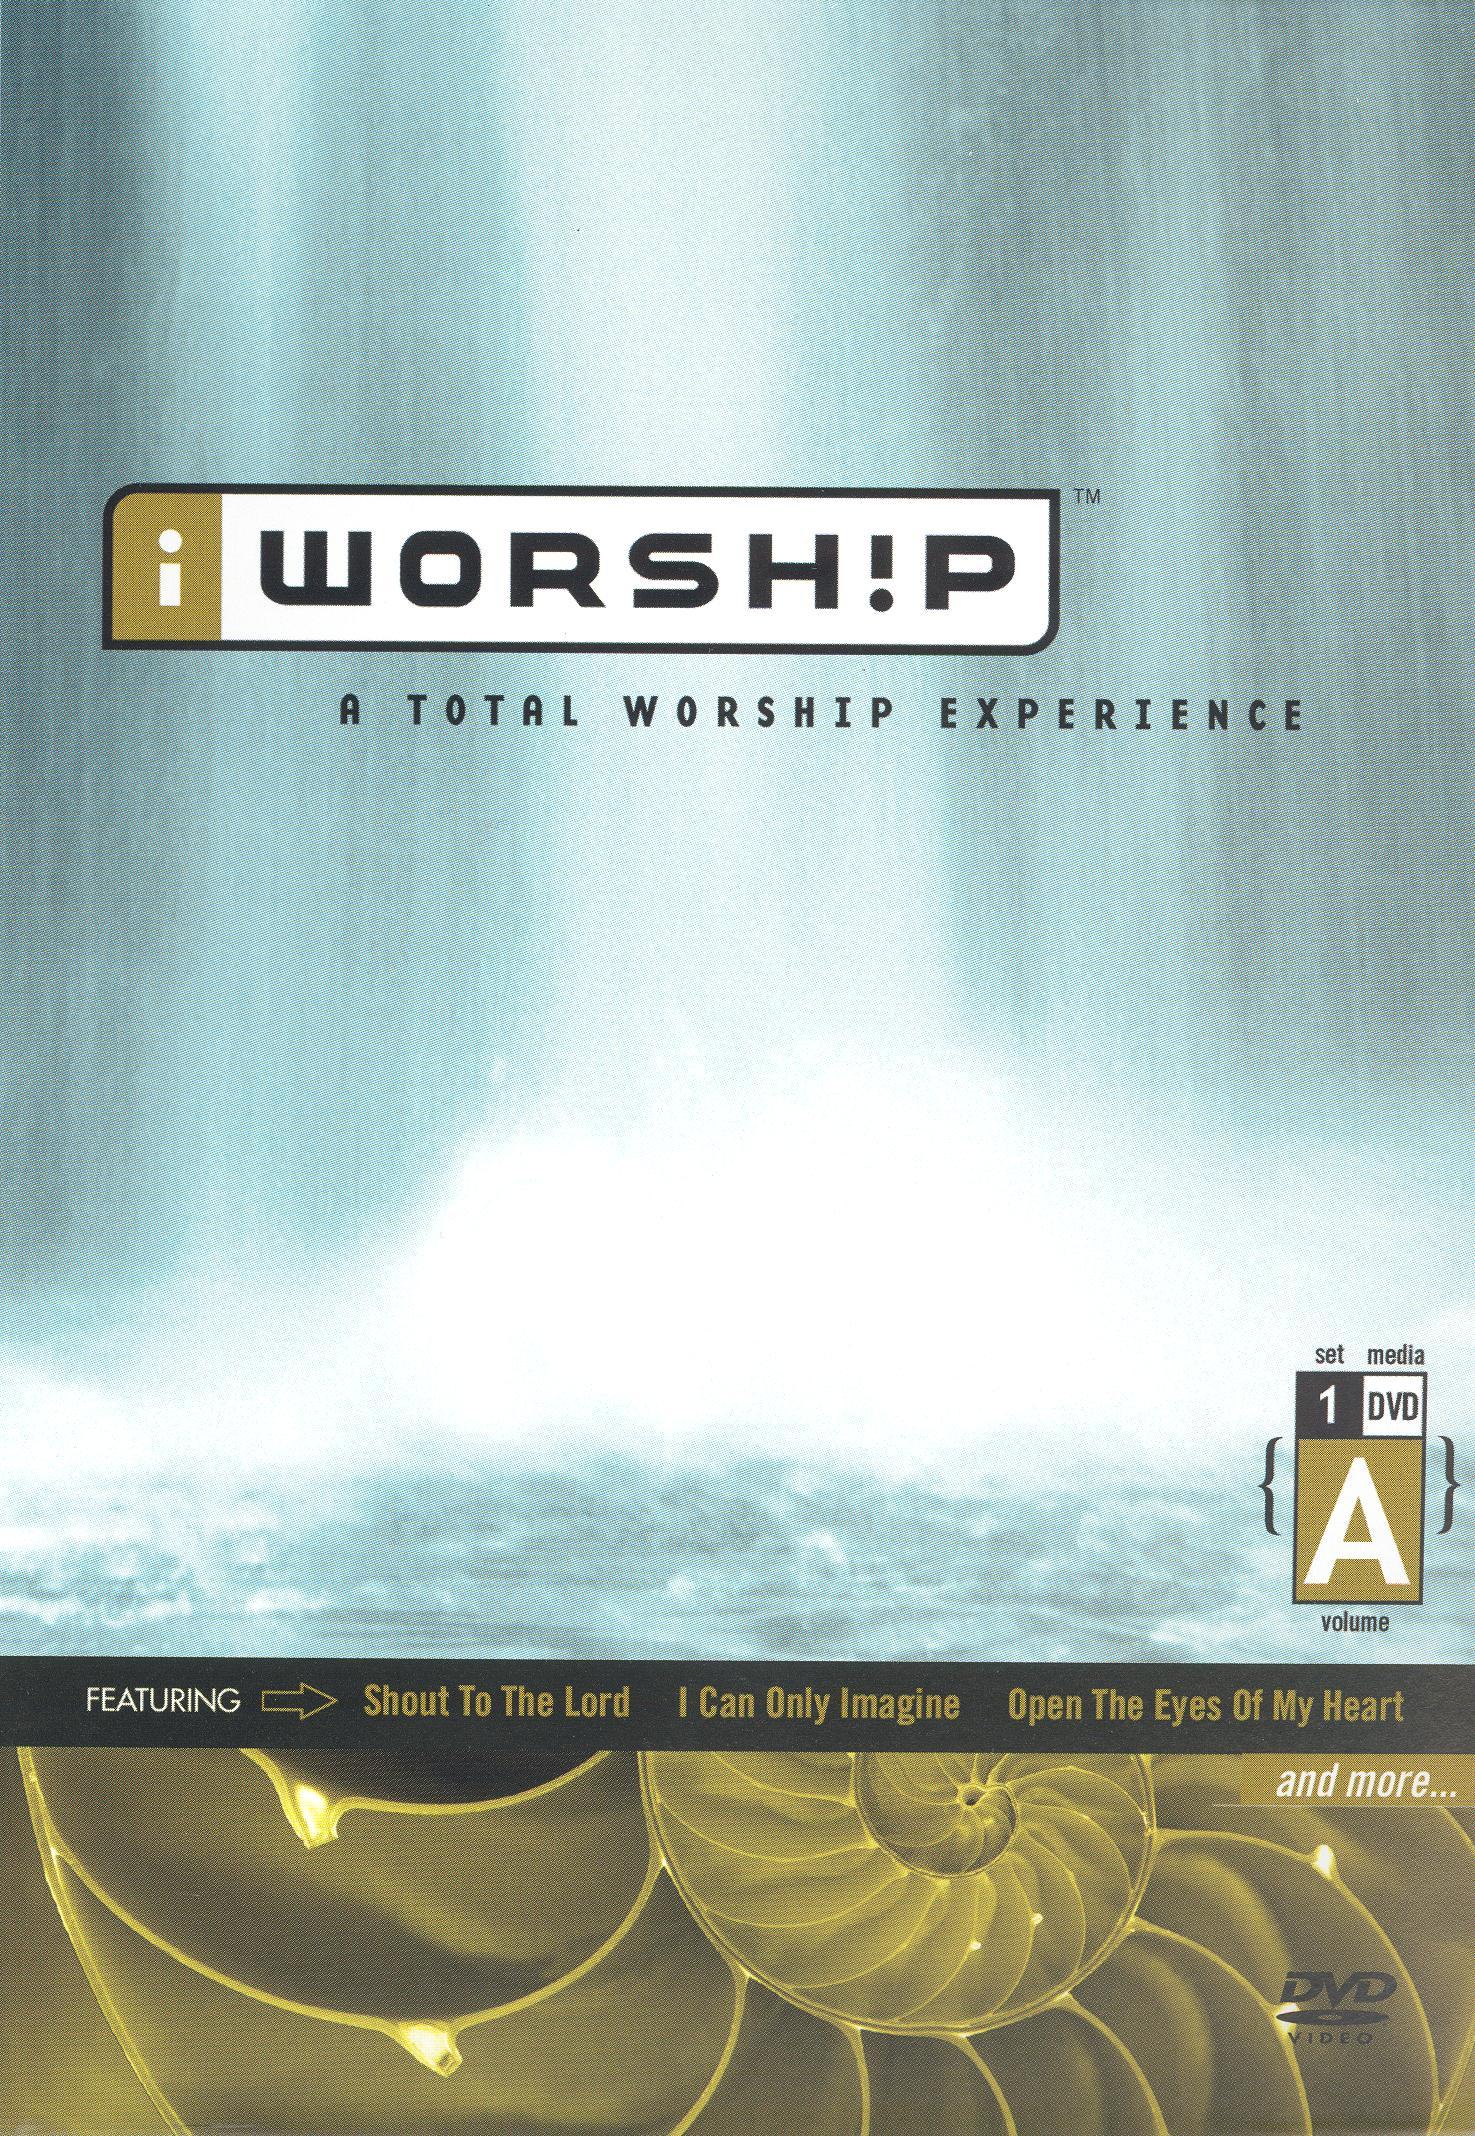 iWorship, Volume A